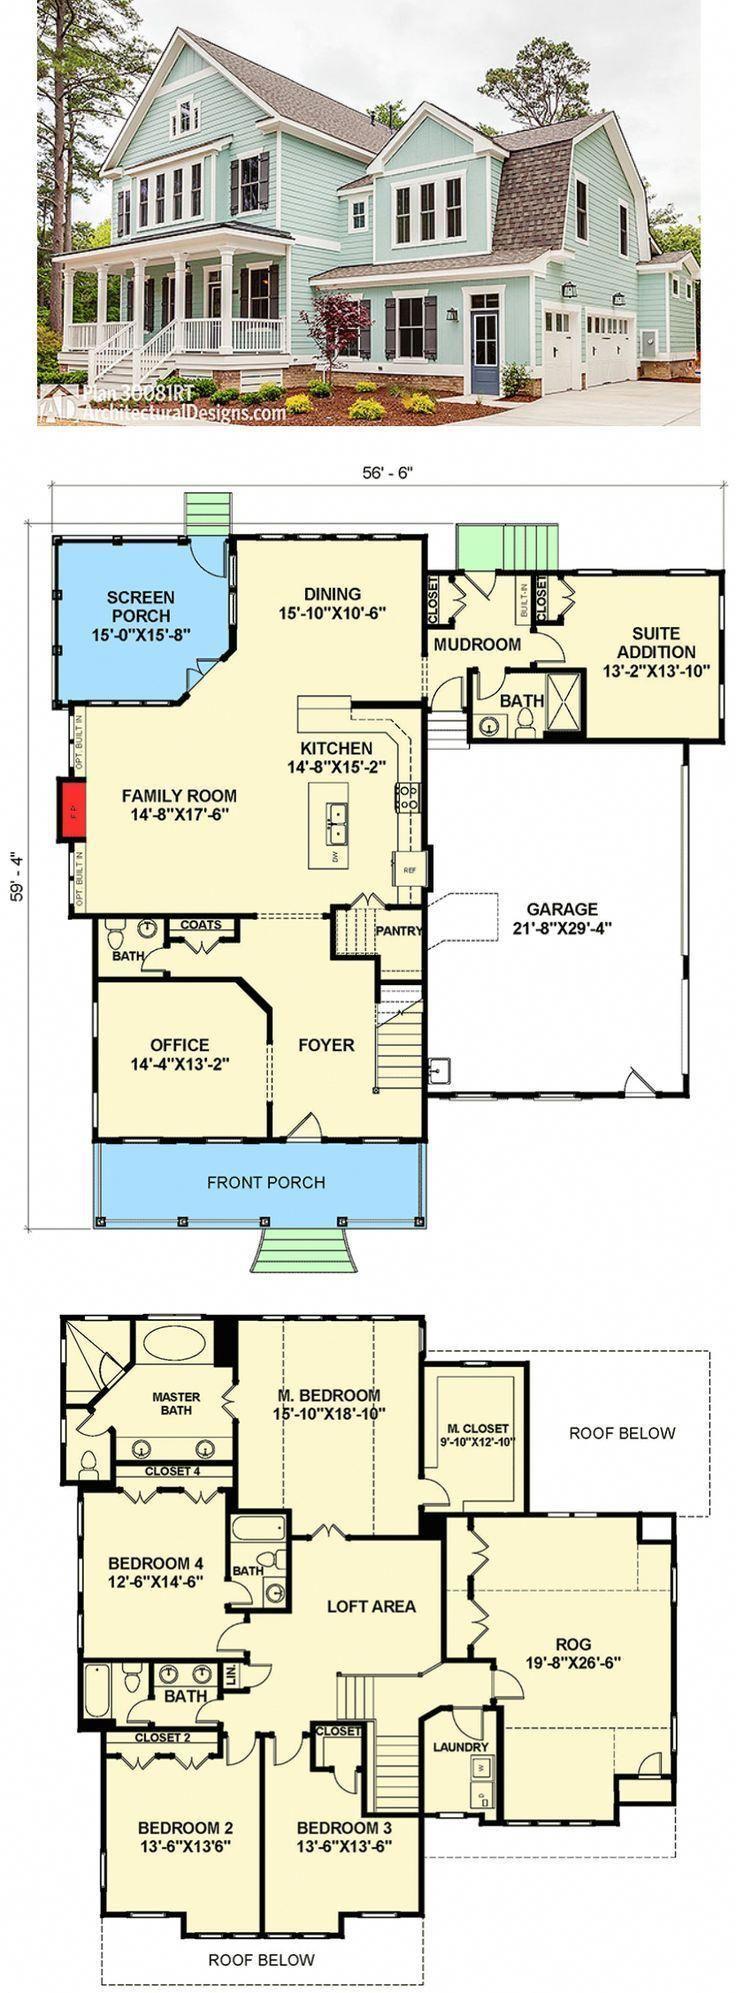 remodel basement,basement ideas,renovate basement,basement